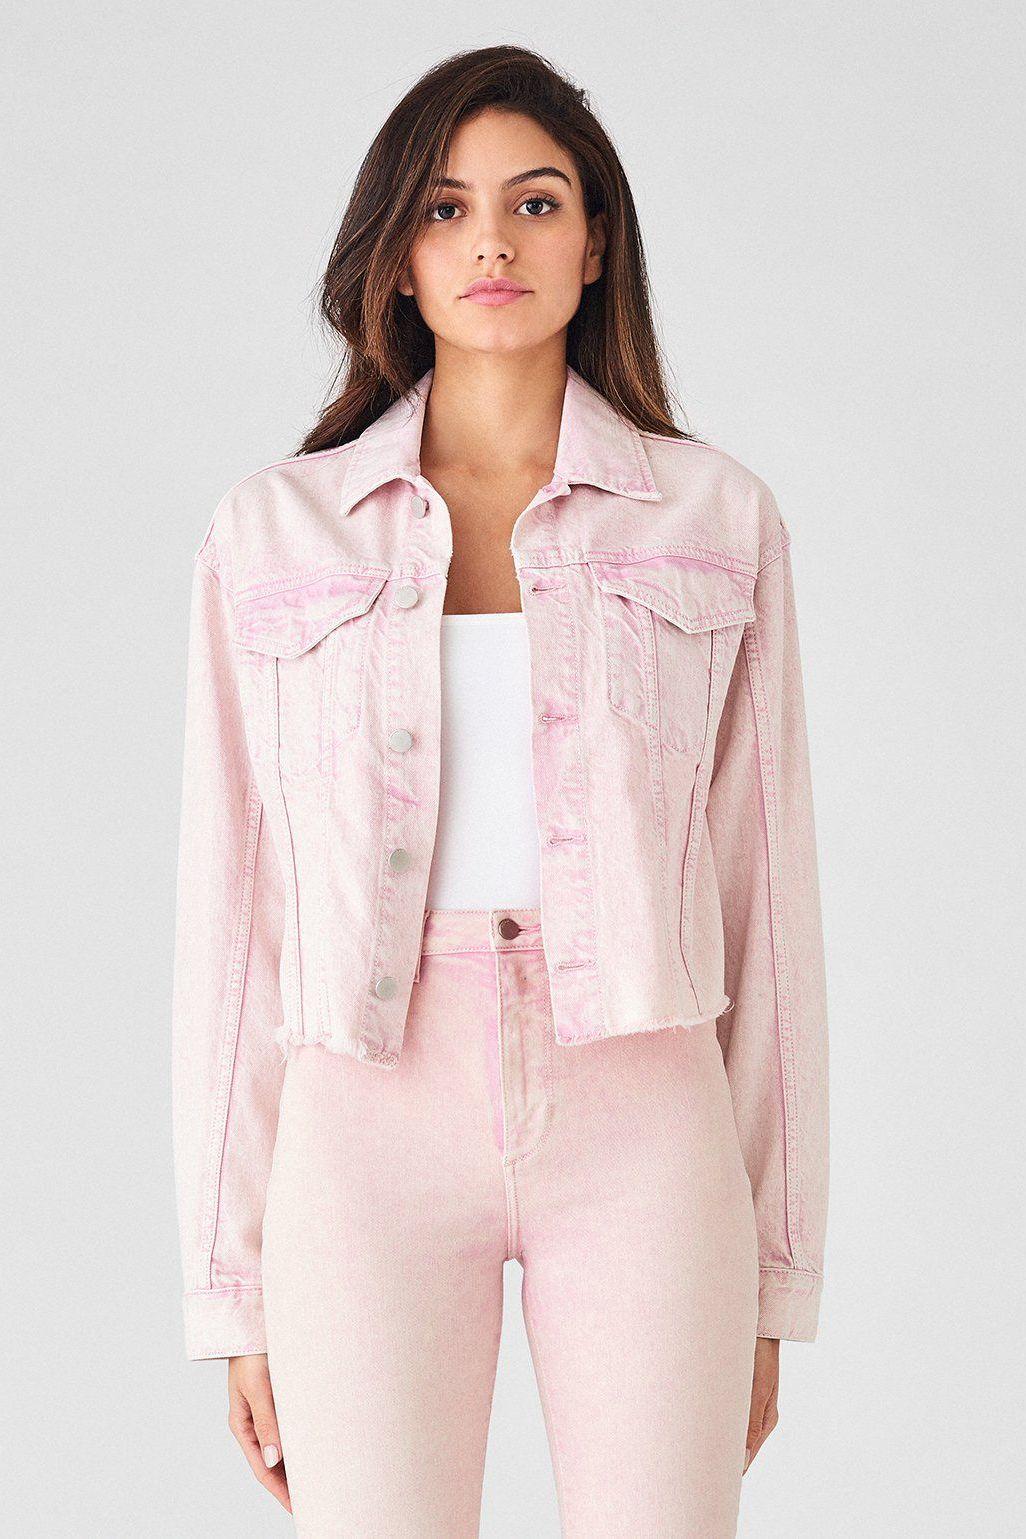 Editor's Choice Annie Cropped Jacket DL1961 $199.00 SHOP IT